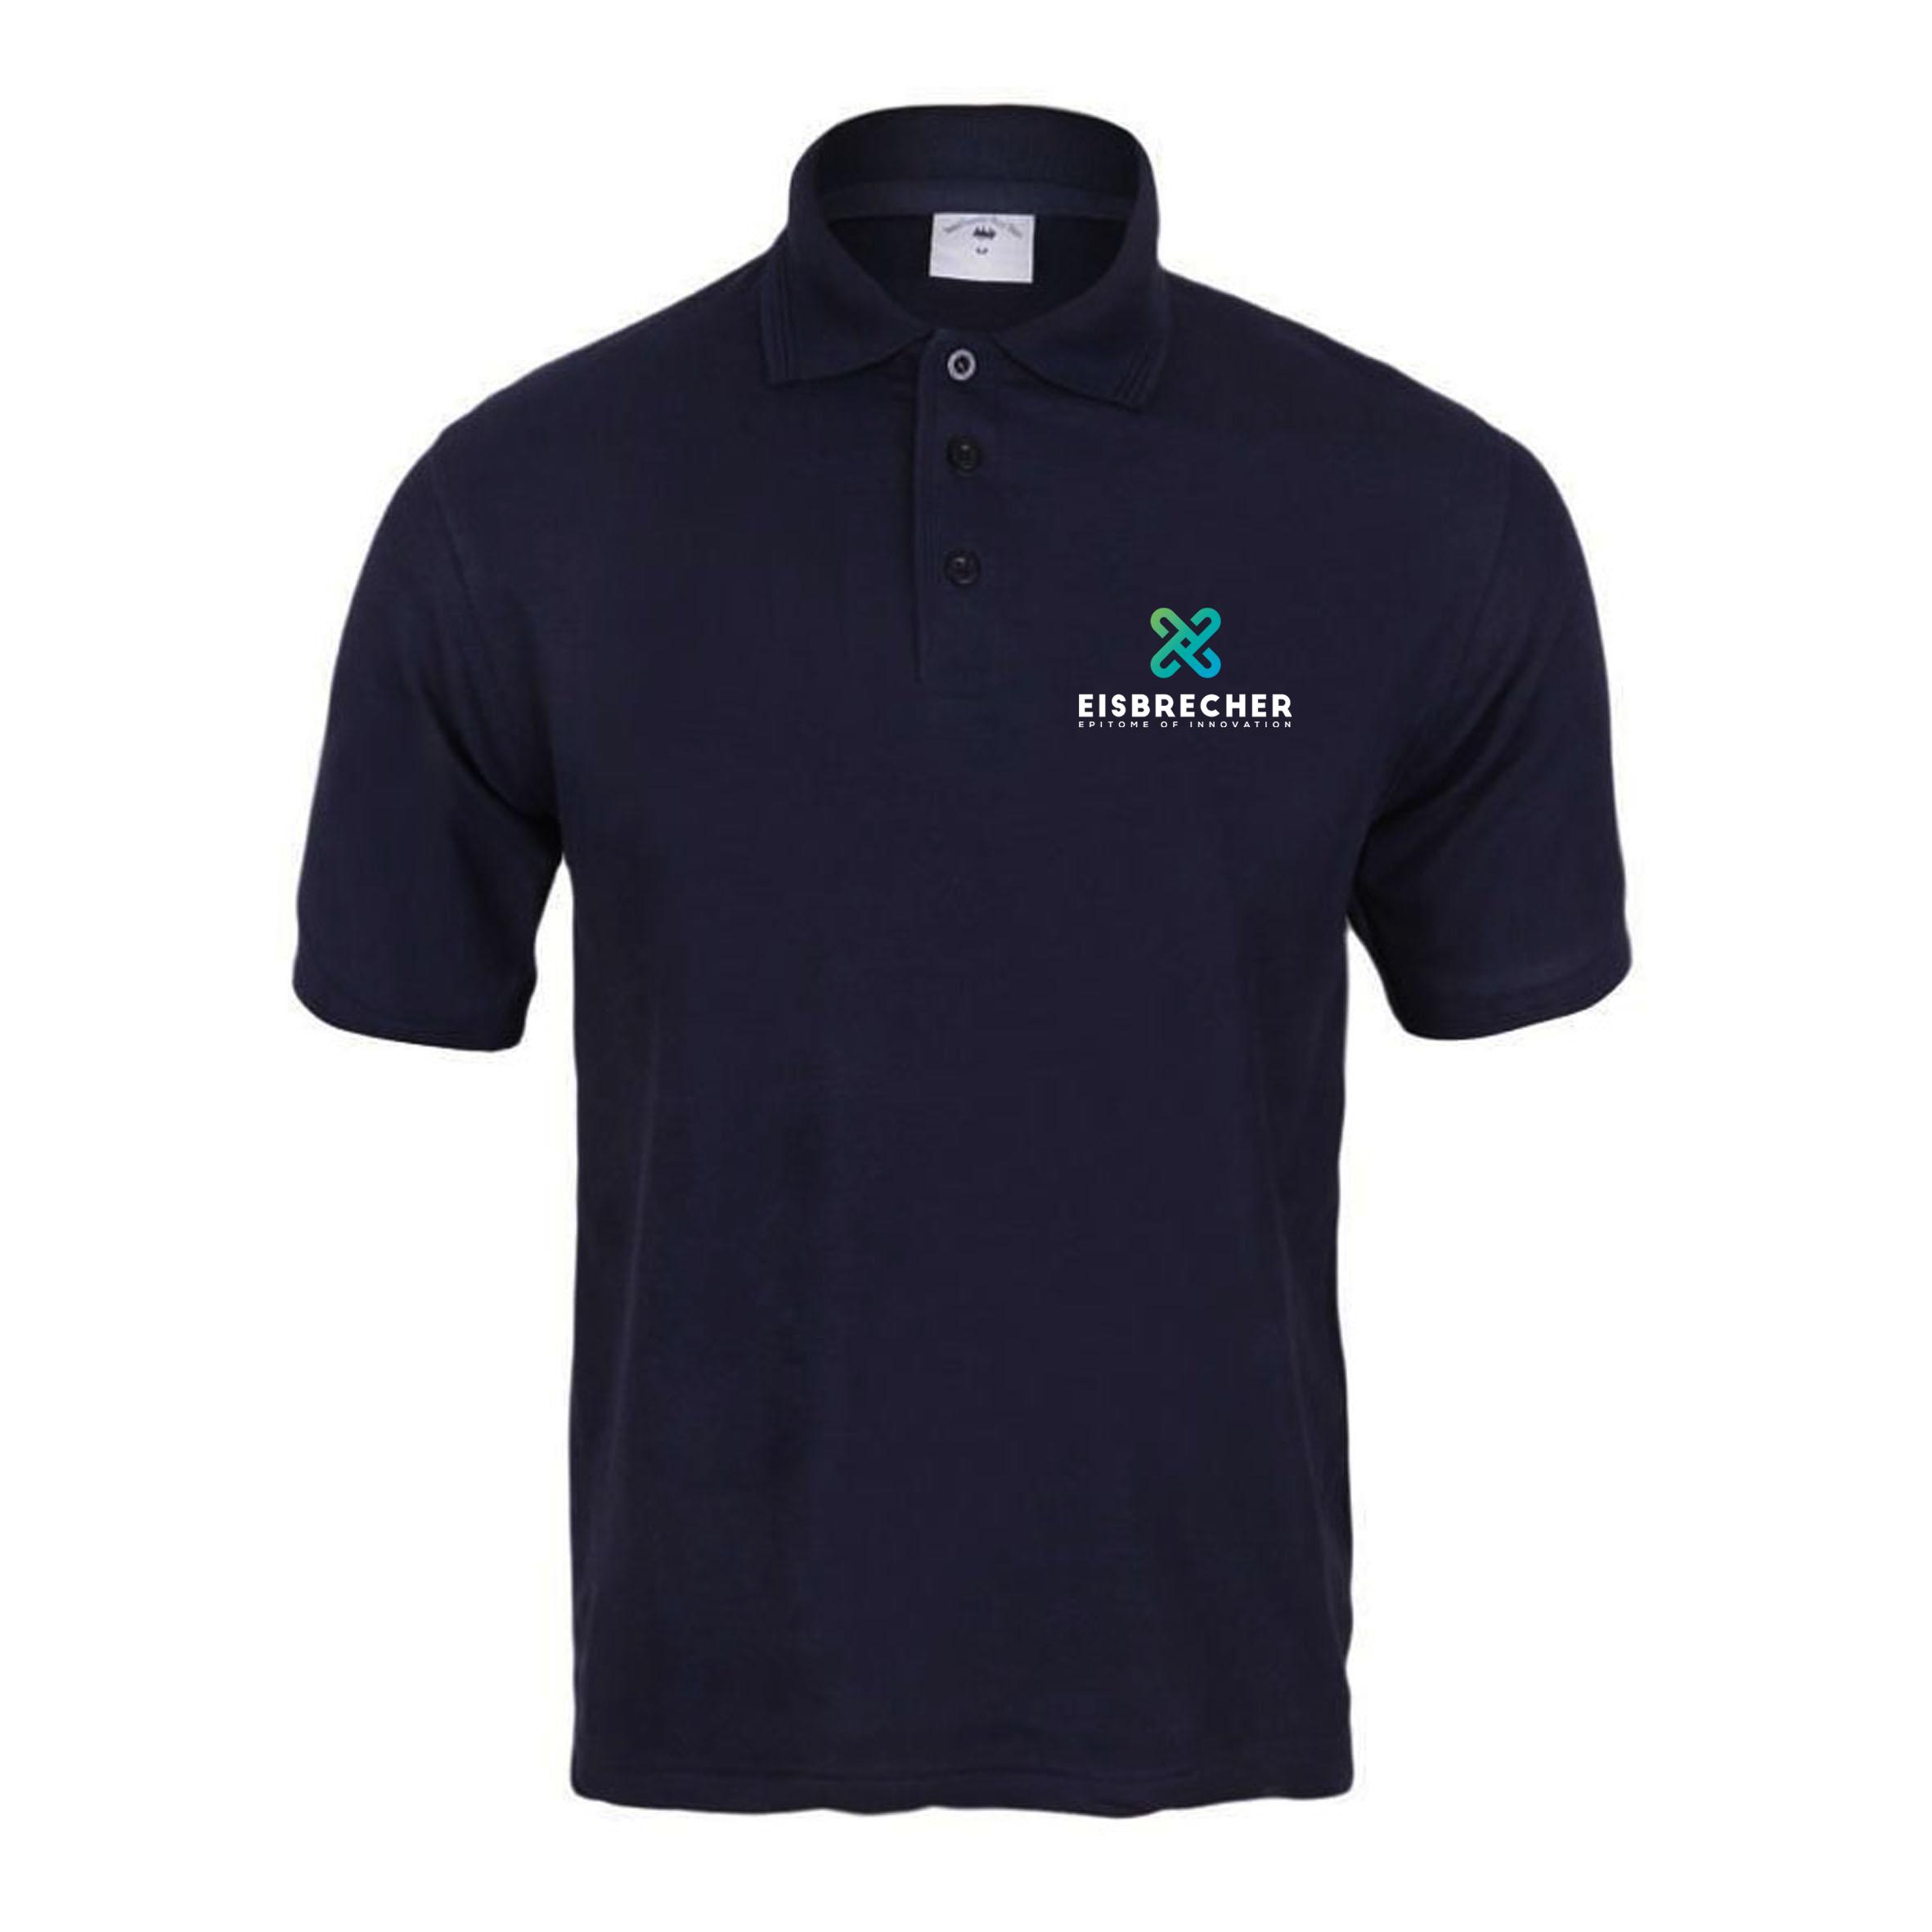 t shirt branding services